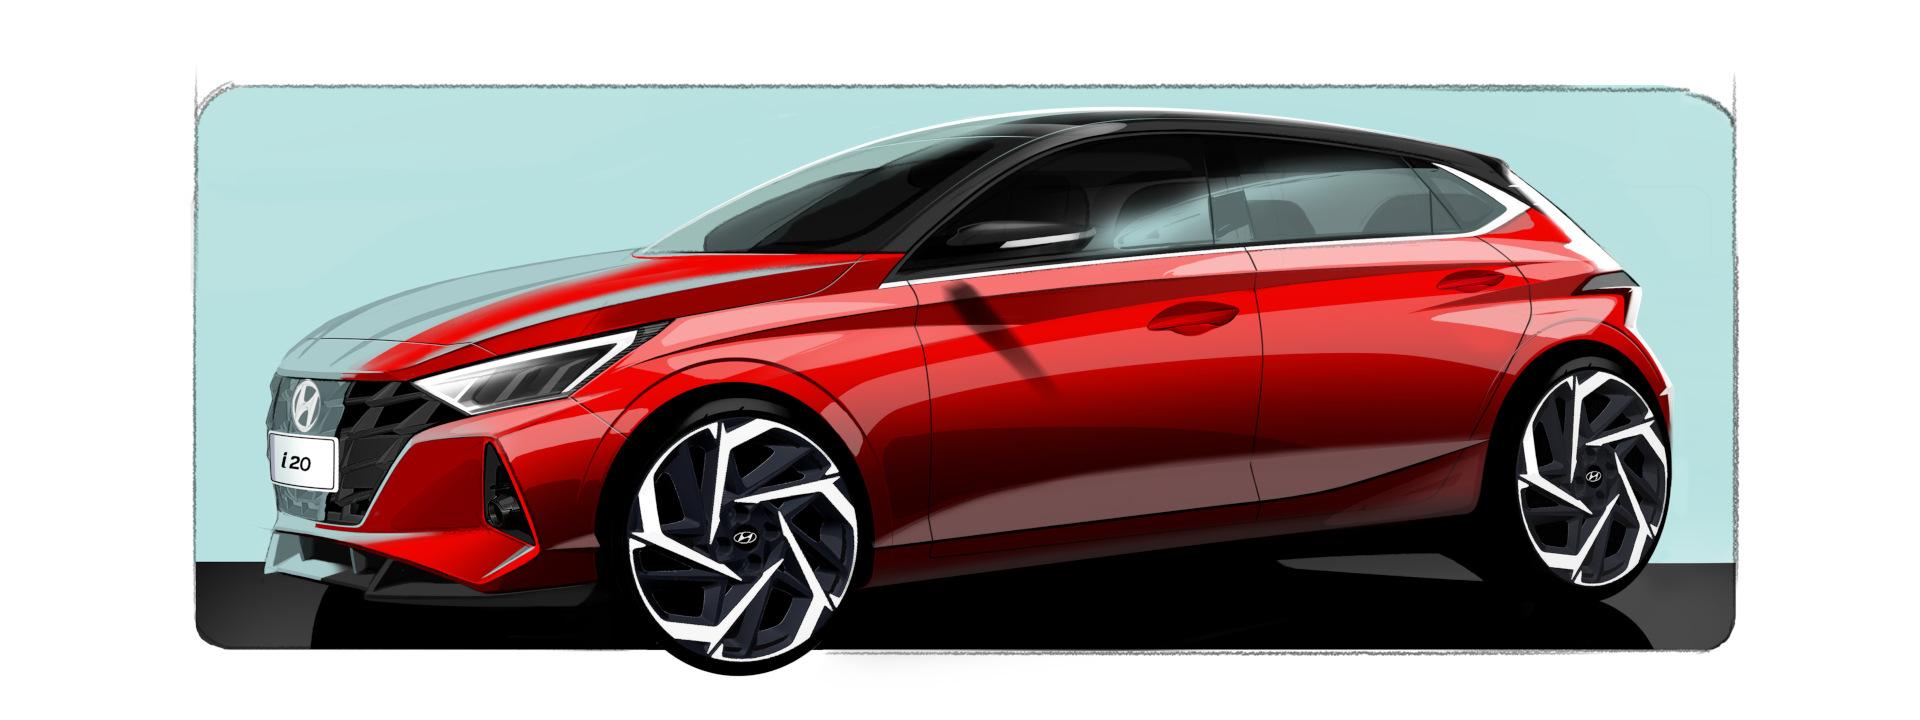 Neue Hyundai i20